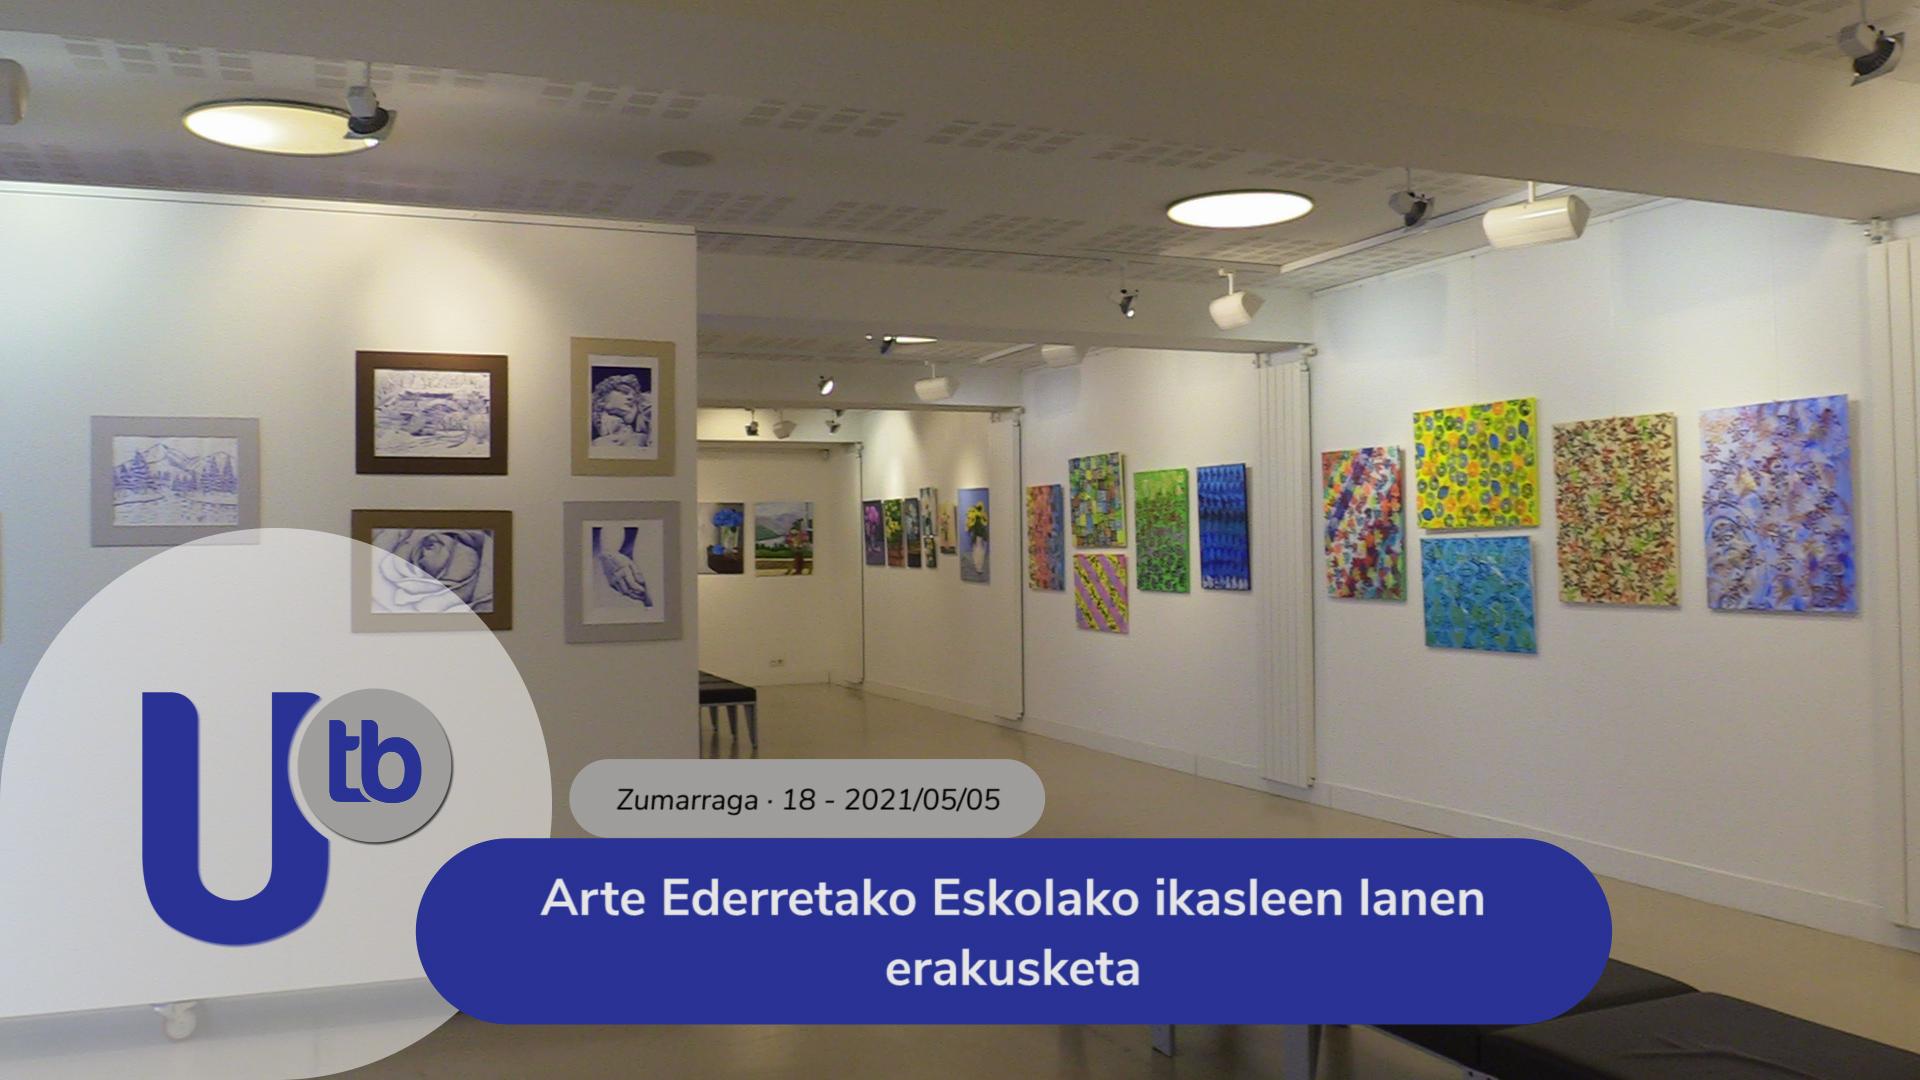 Arte Ederretako Eskolako ikasleen lanen erakusketa / Exposición de alumnos de Bellas Artes